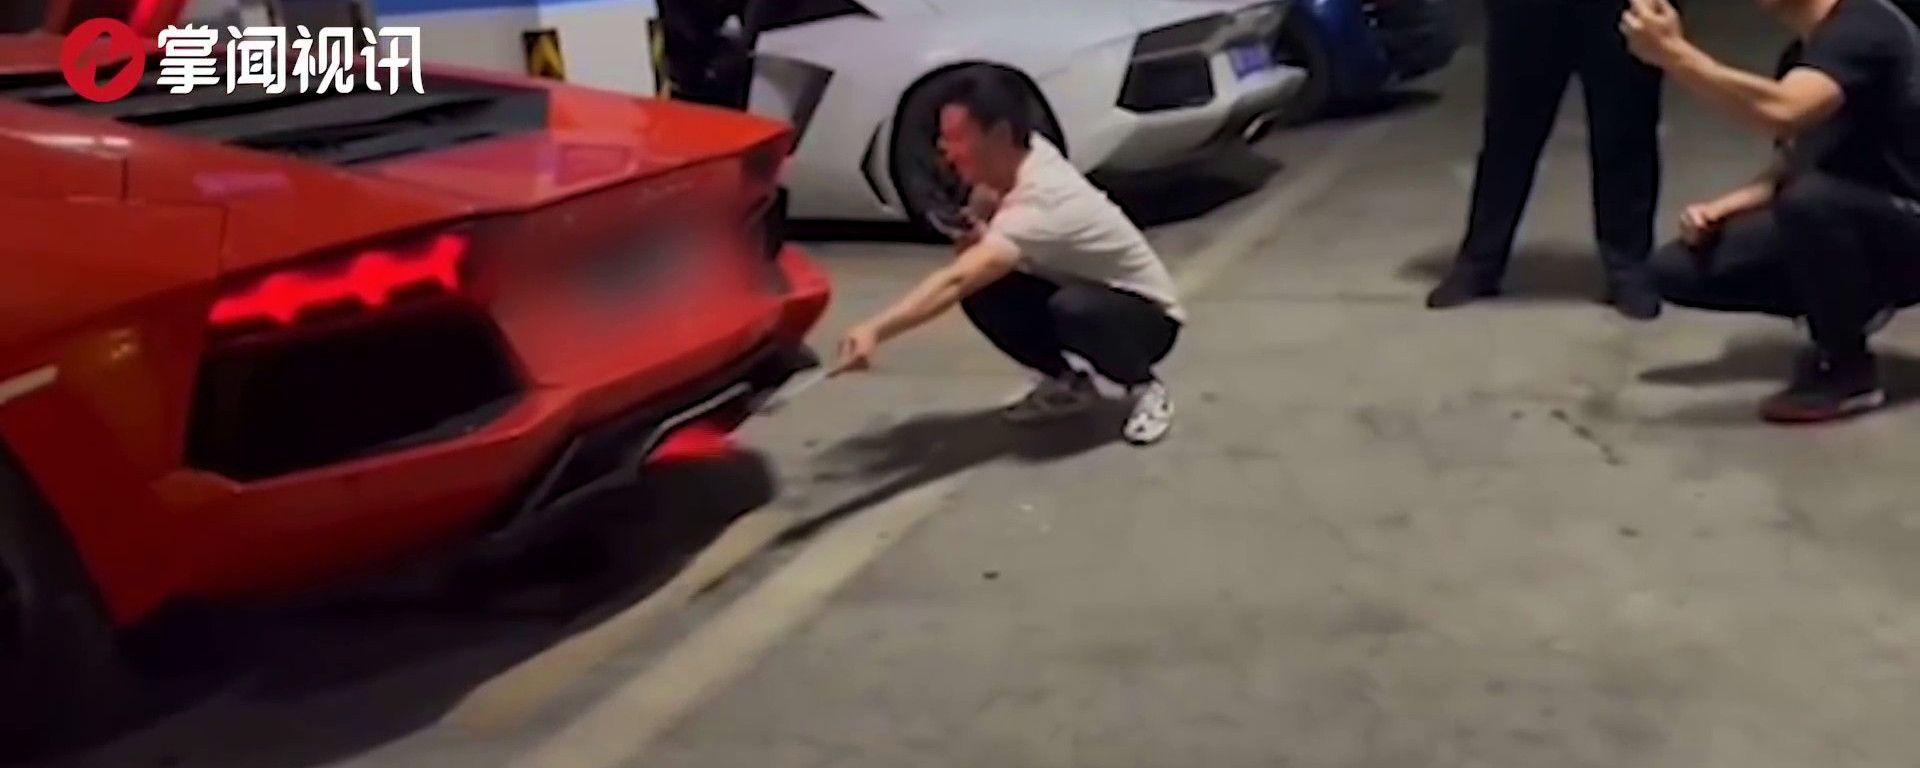 Lamborghini Aventador vs kebab: vincerà il kebab